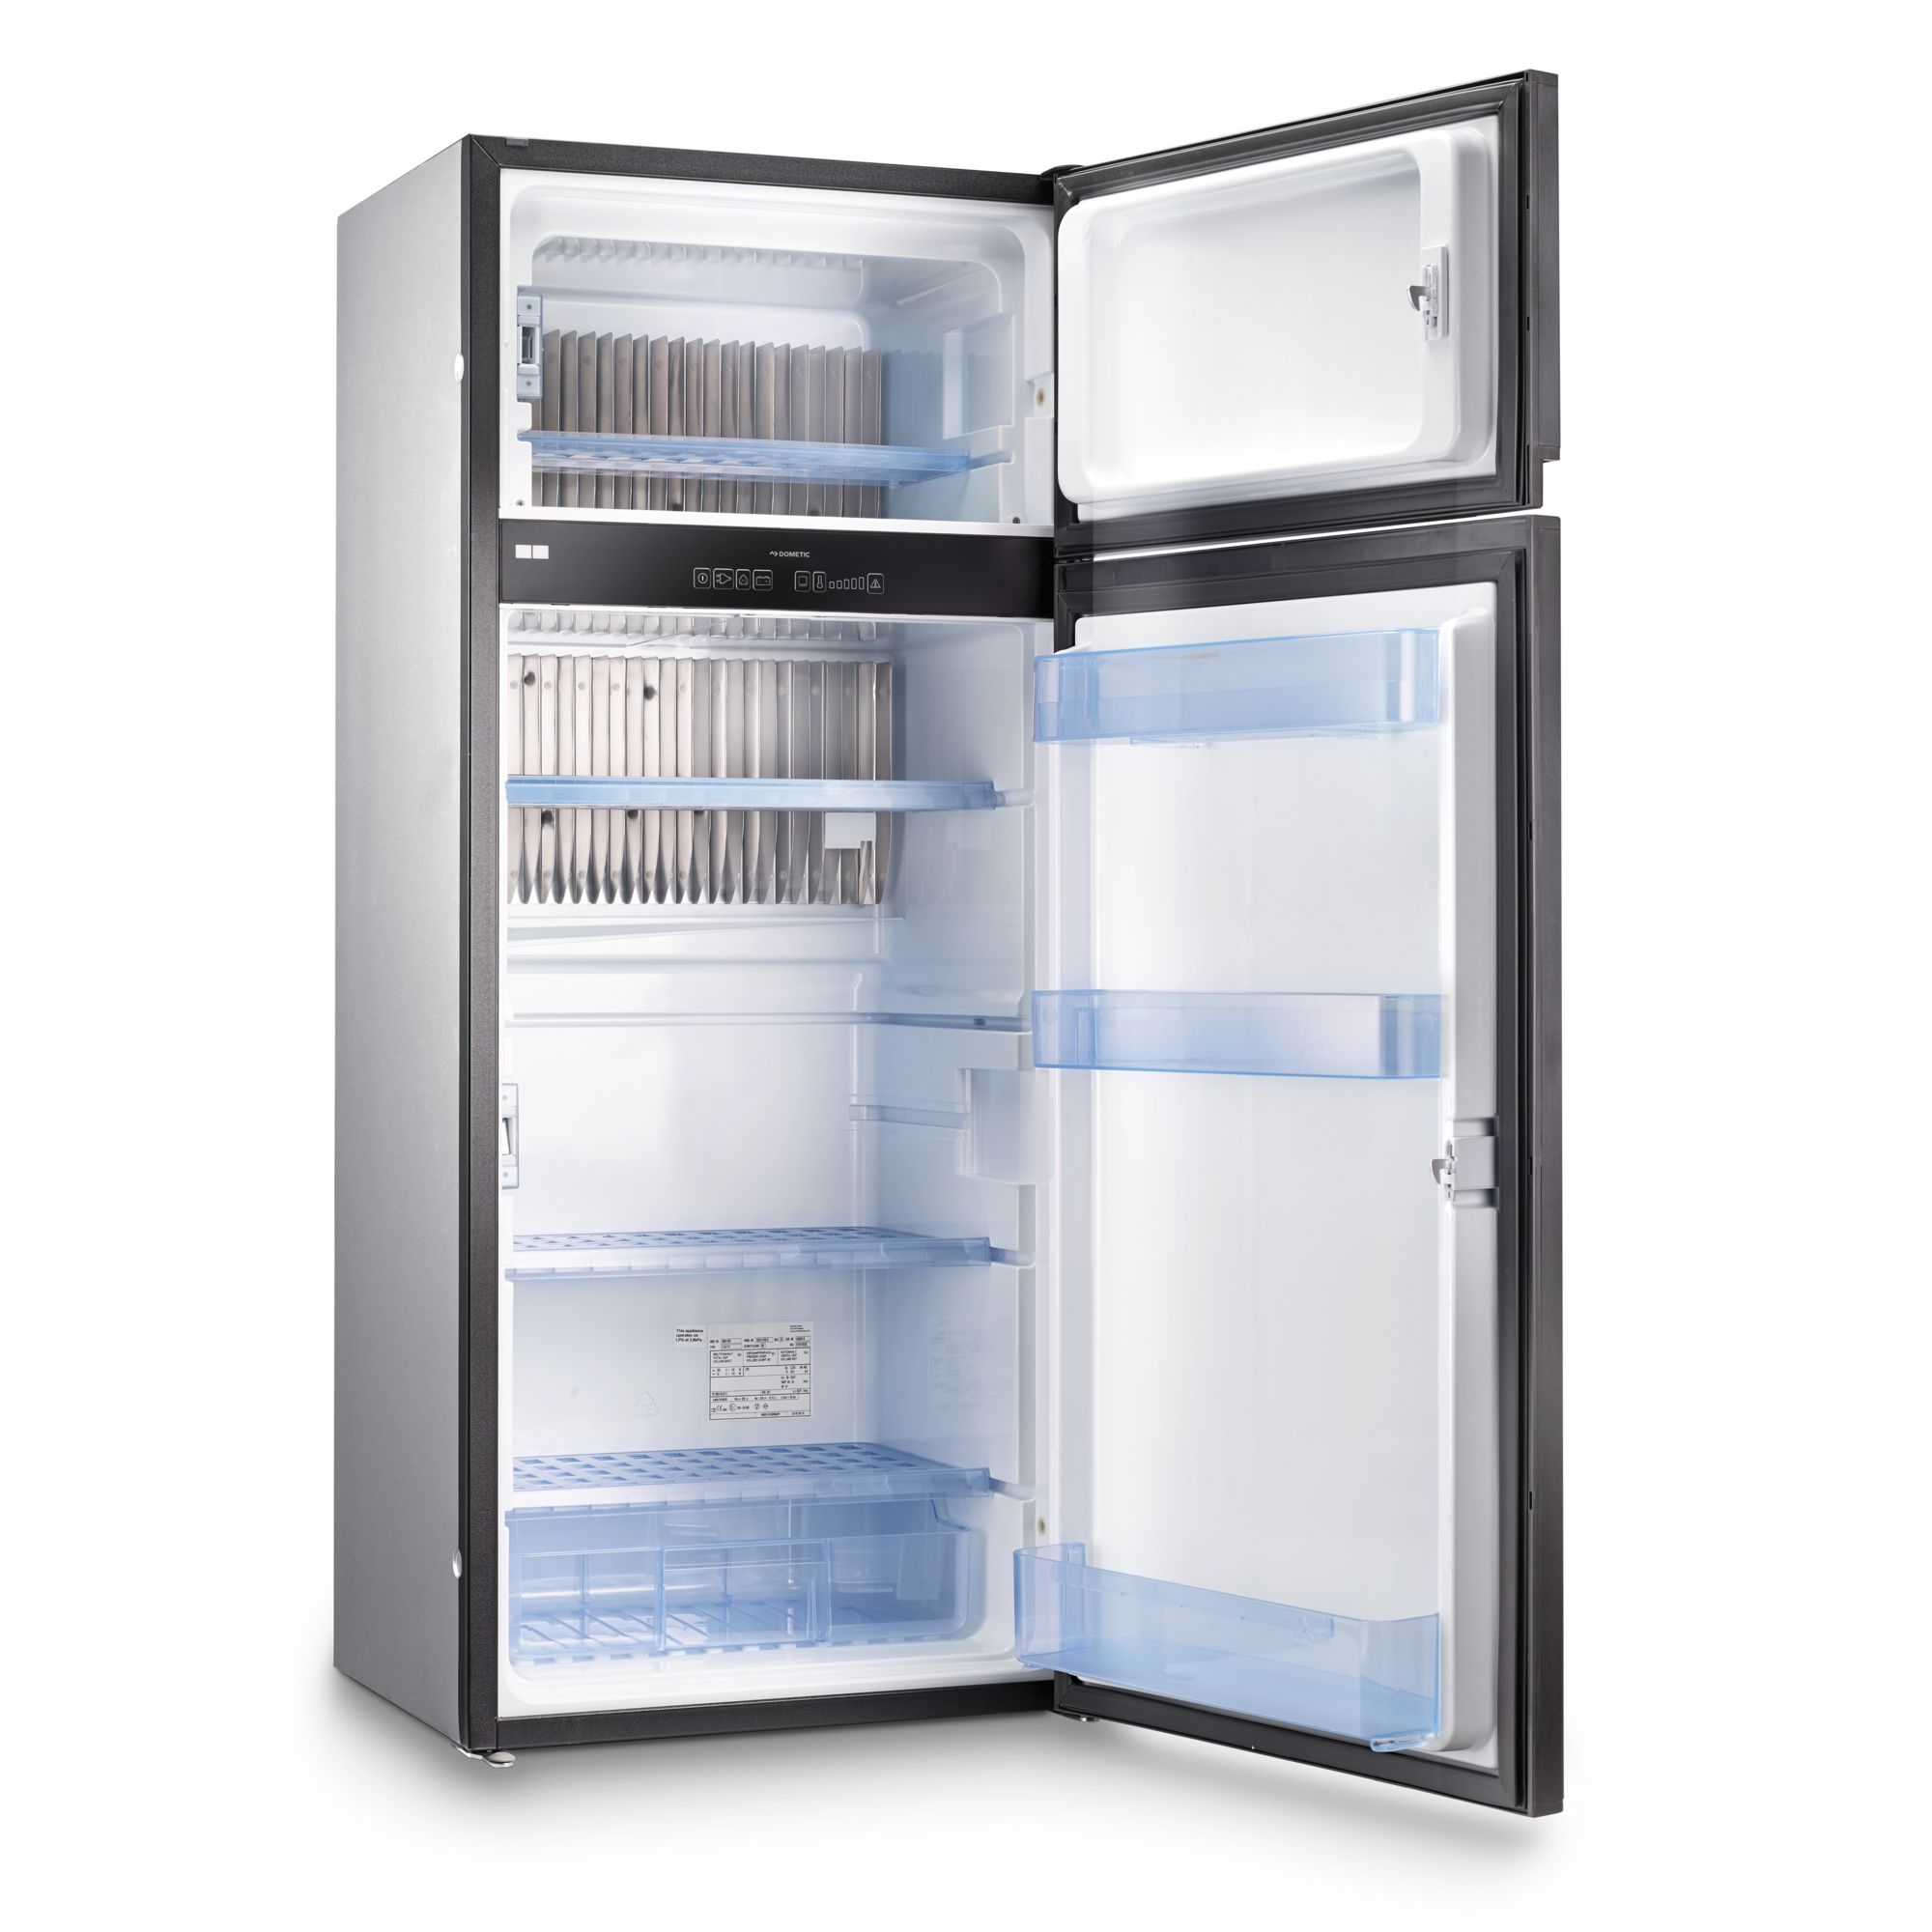 Dometic RM8505 Absorber-Kühlschrank 106 Liter NEU /& OVP